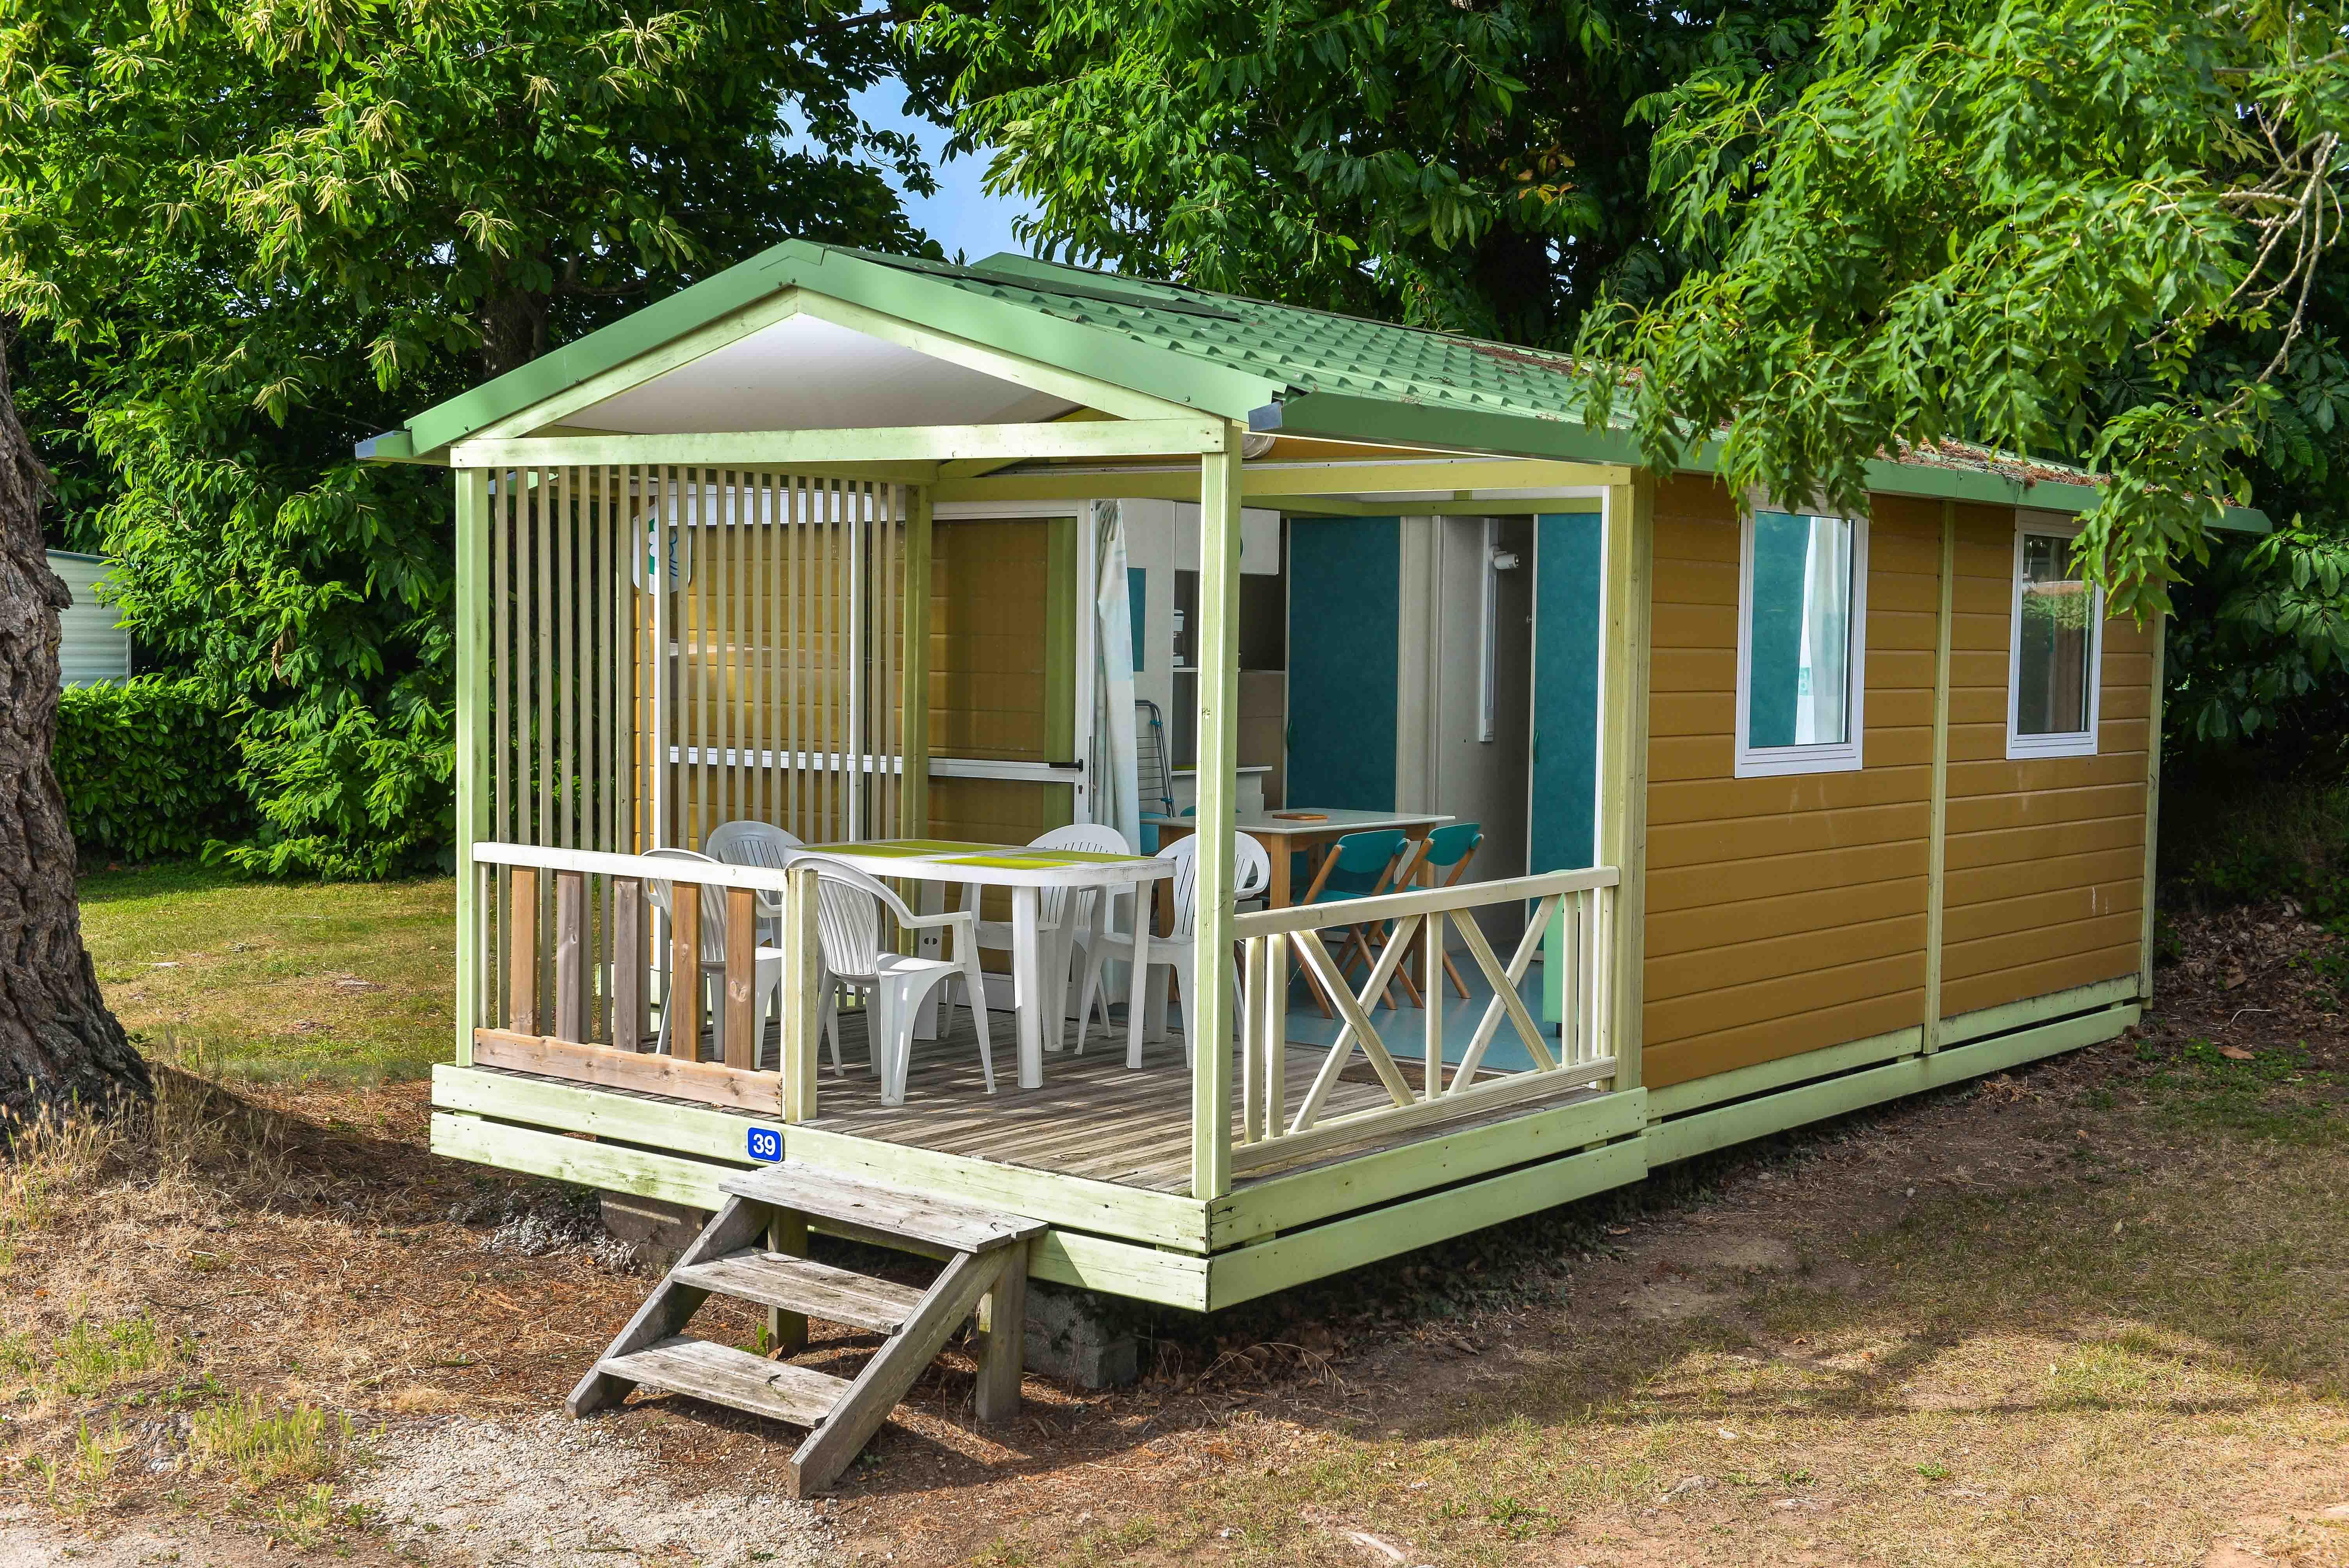 Location - Chalet Confort 25M² (2 Chambres ) + Terrasse Couverte - Flower Camping Le Kergariou